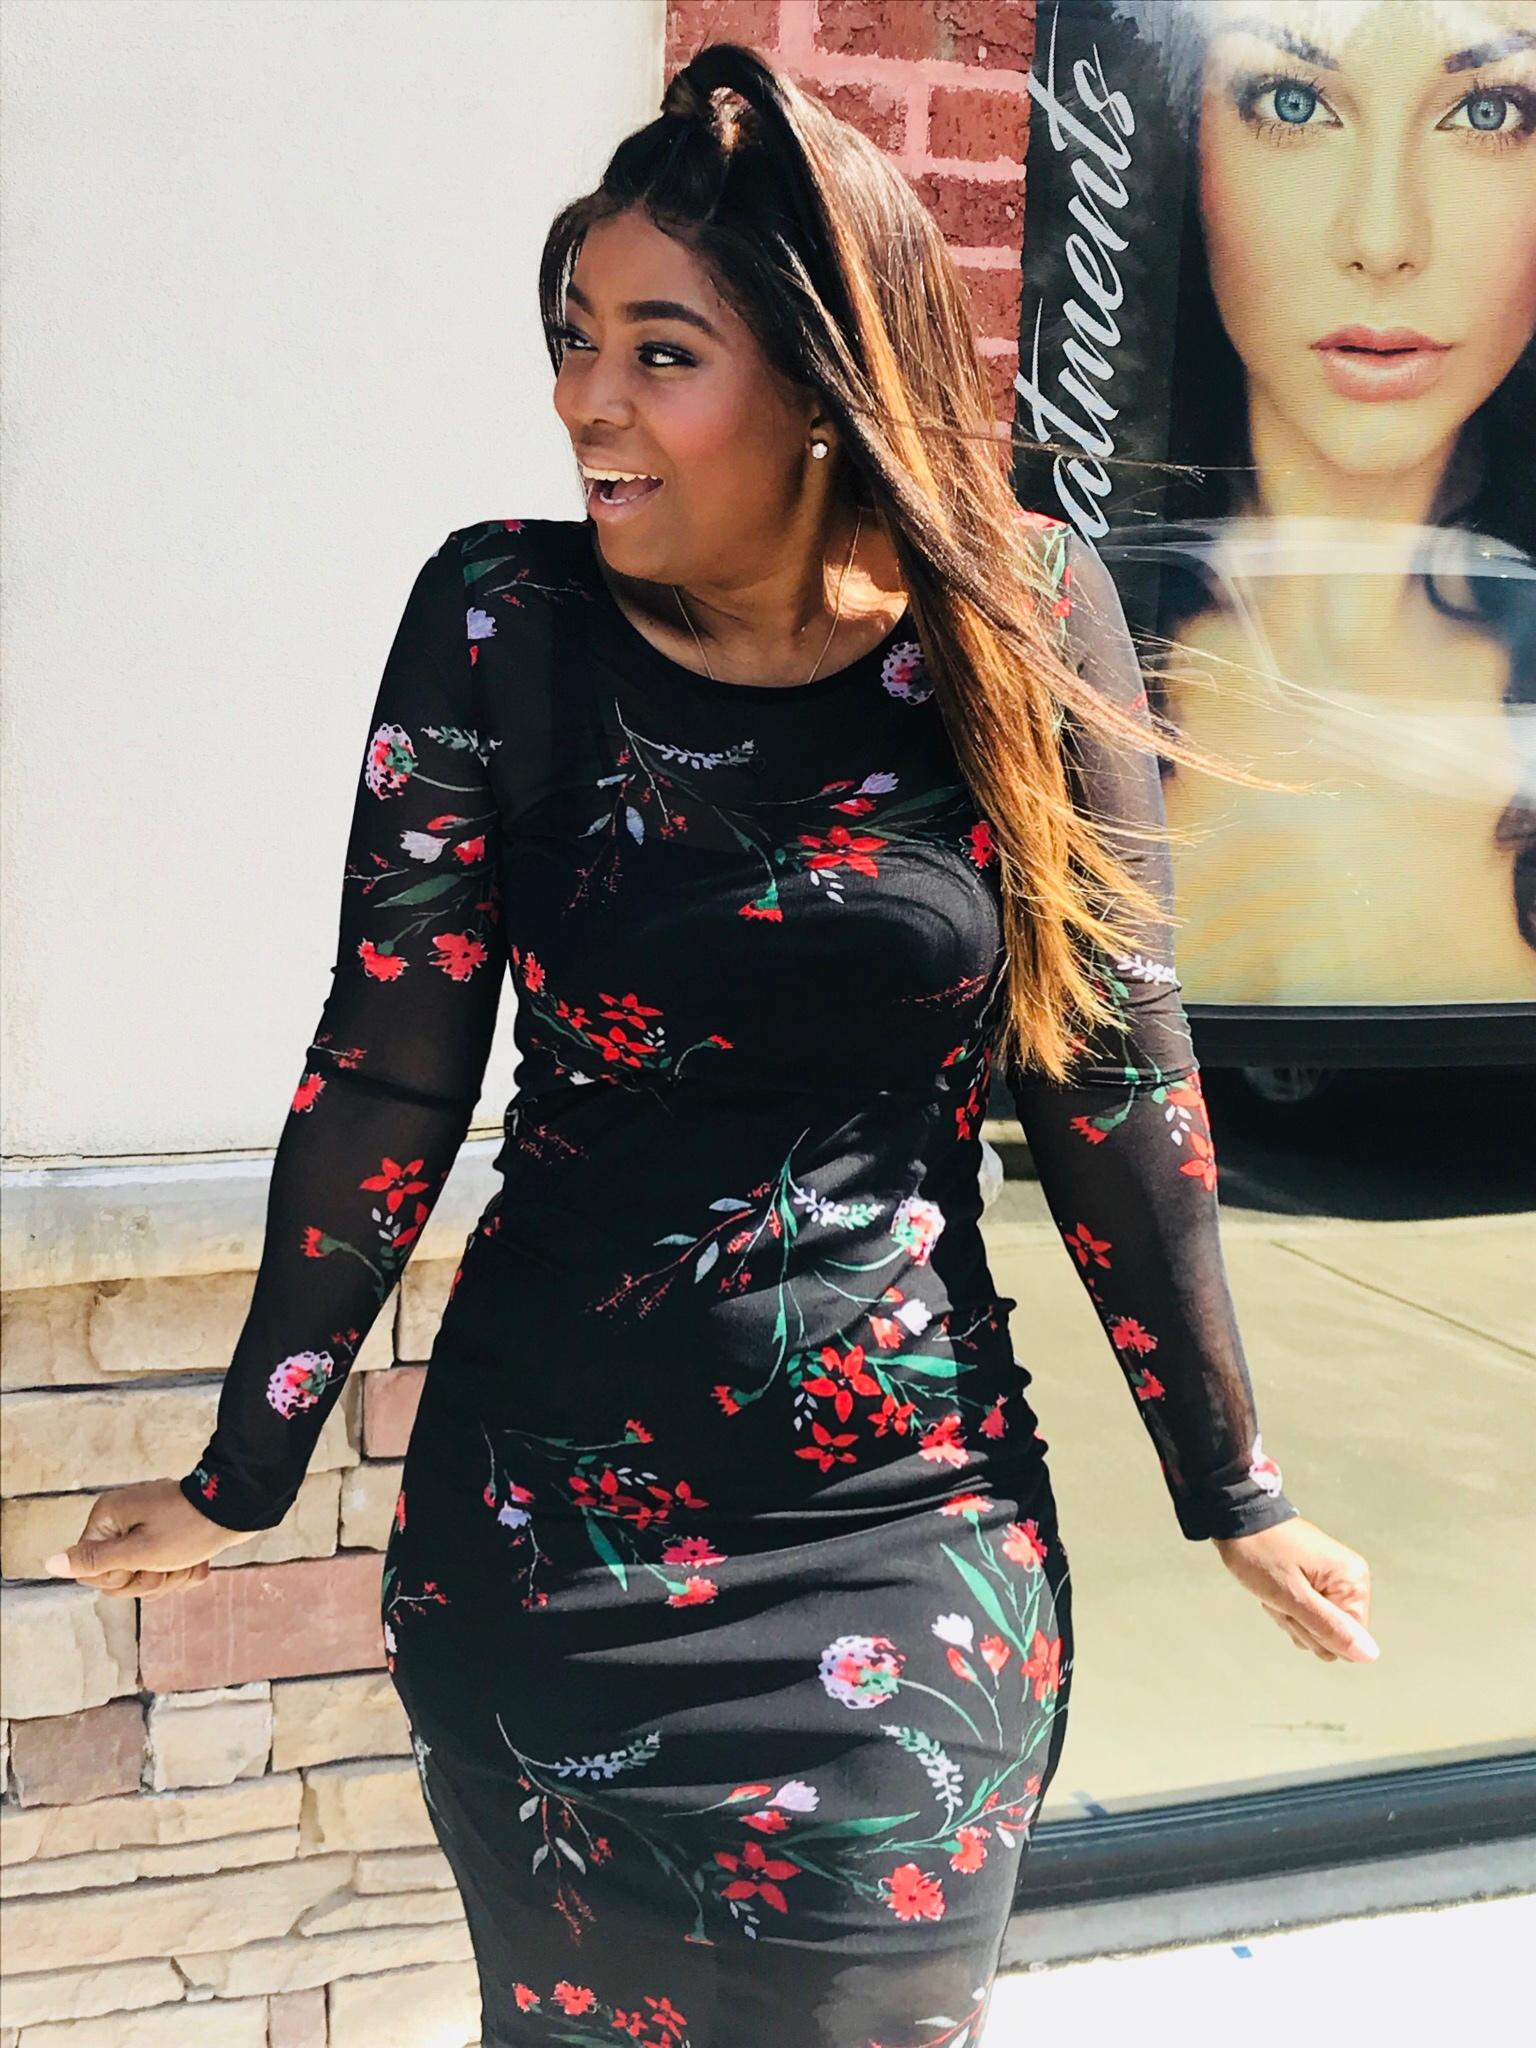 My Style: Mesh Bodycon Floral Print Dress